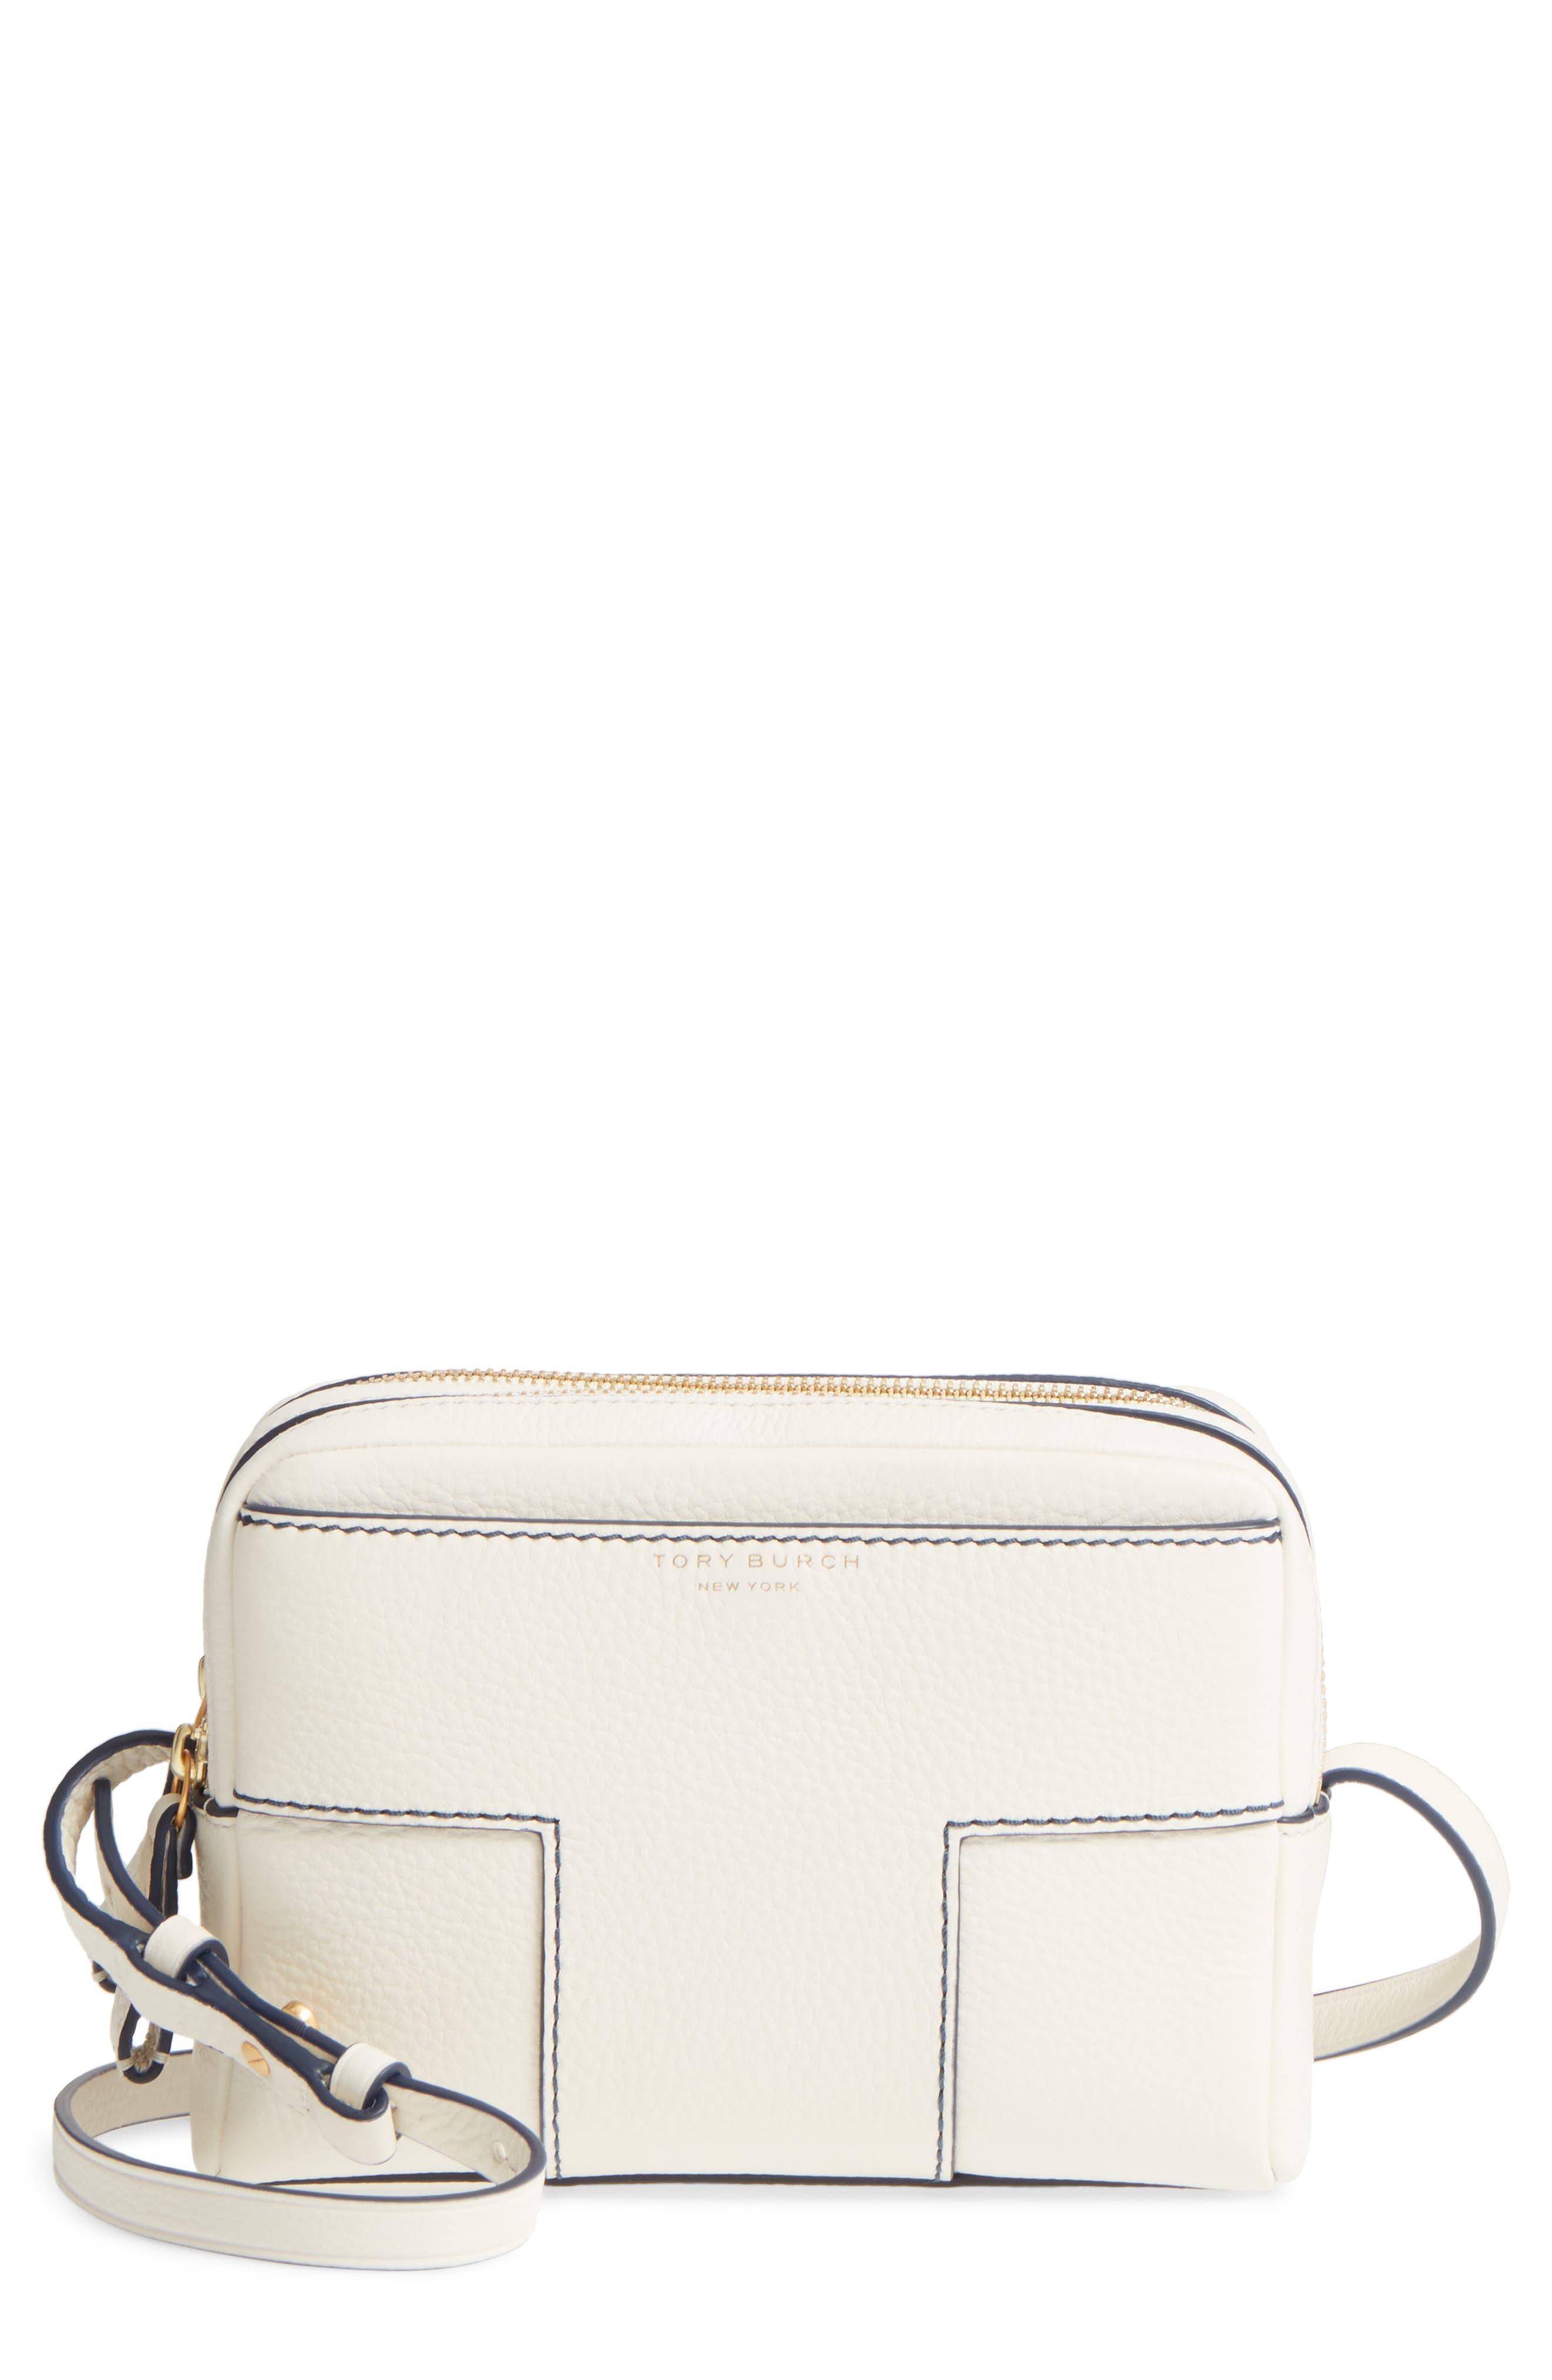 Block-T Double Zip Leather Crossbody Bag,                             Main thumbnail 1, color,                             100